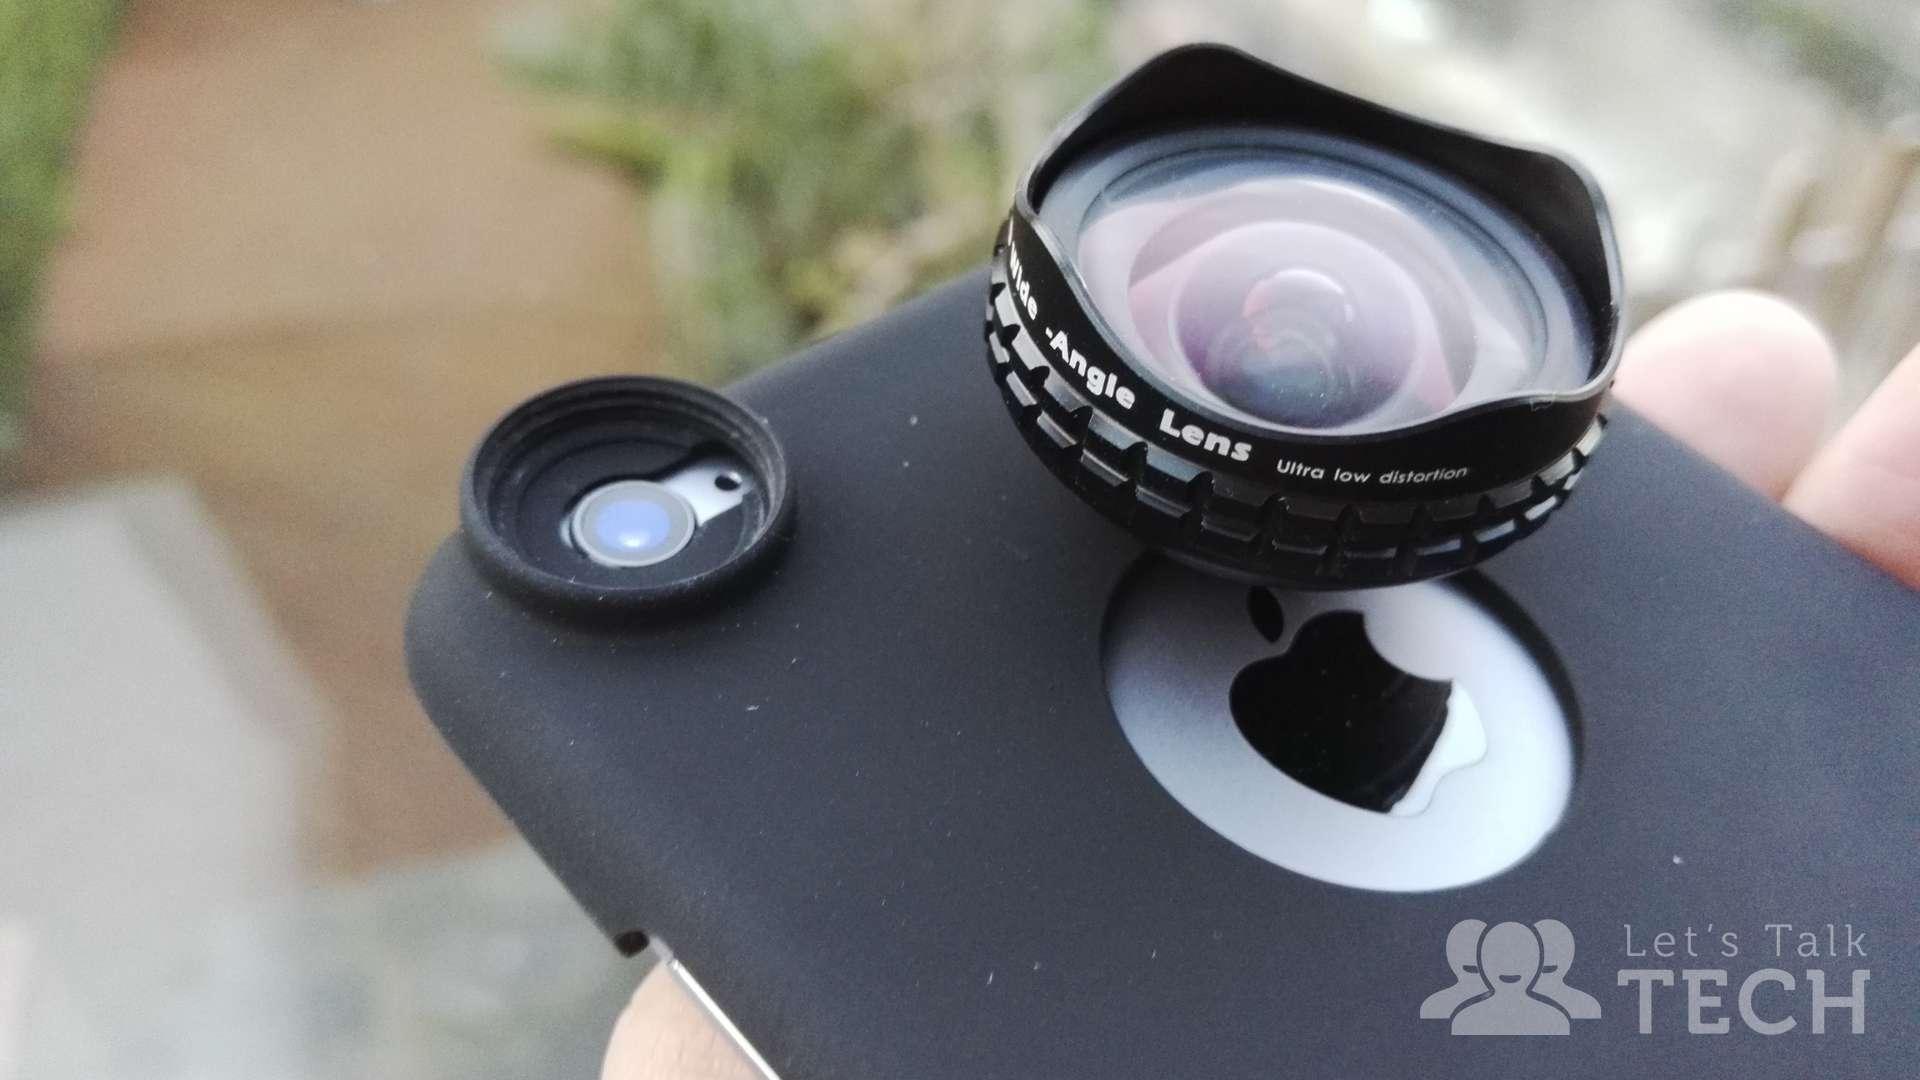 Aukey-Optic-Pro-Lens-screw-lens